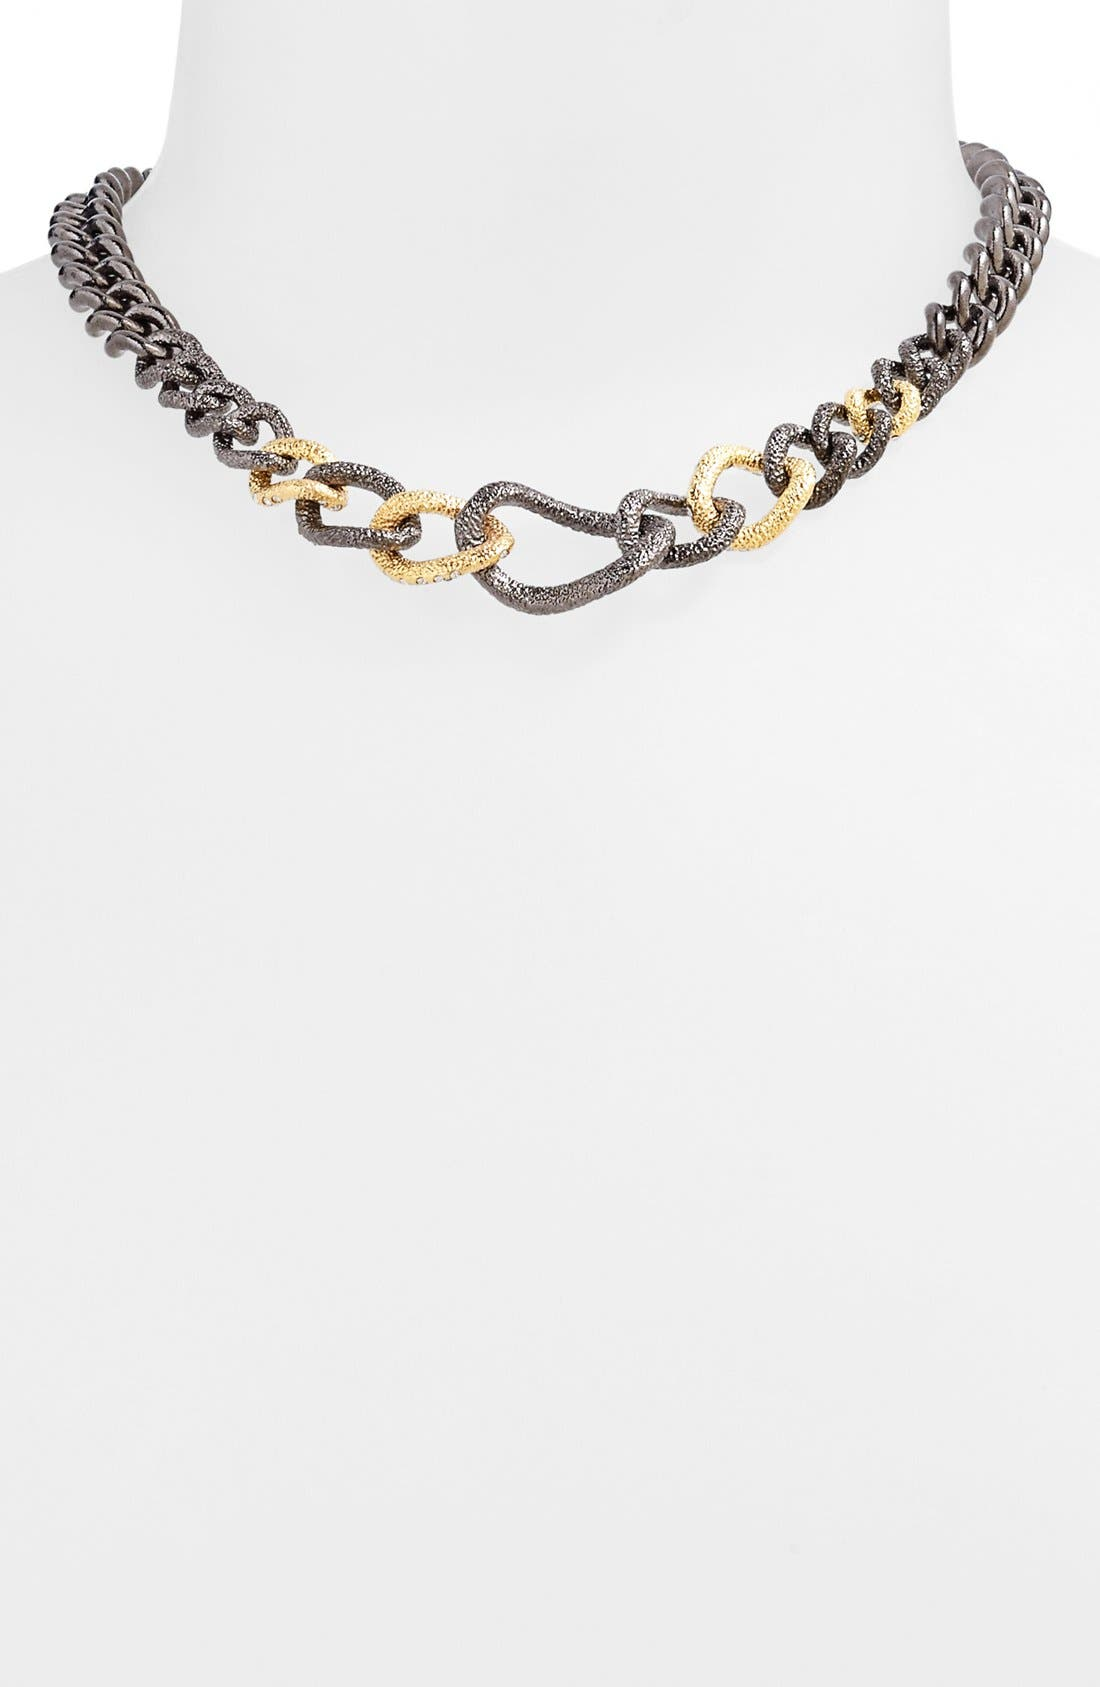 Alternate Image 1 Selected - Alexis Bittar 'Elements - Jardin de Papillon' Link Collar Necklace